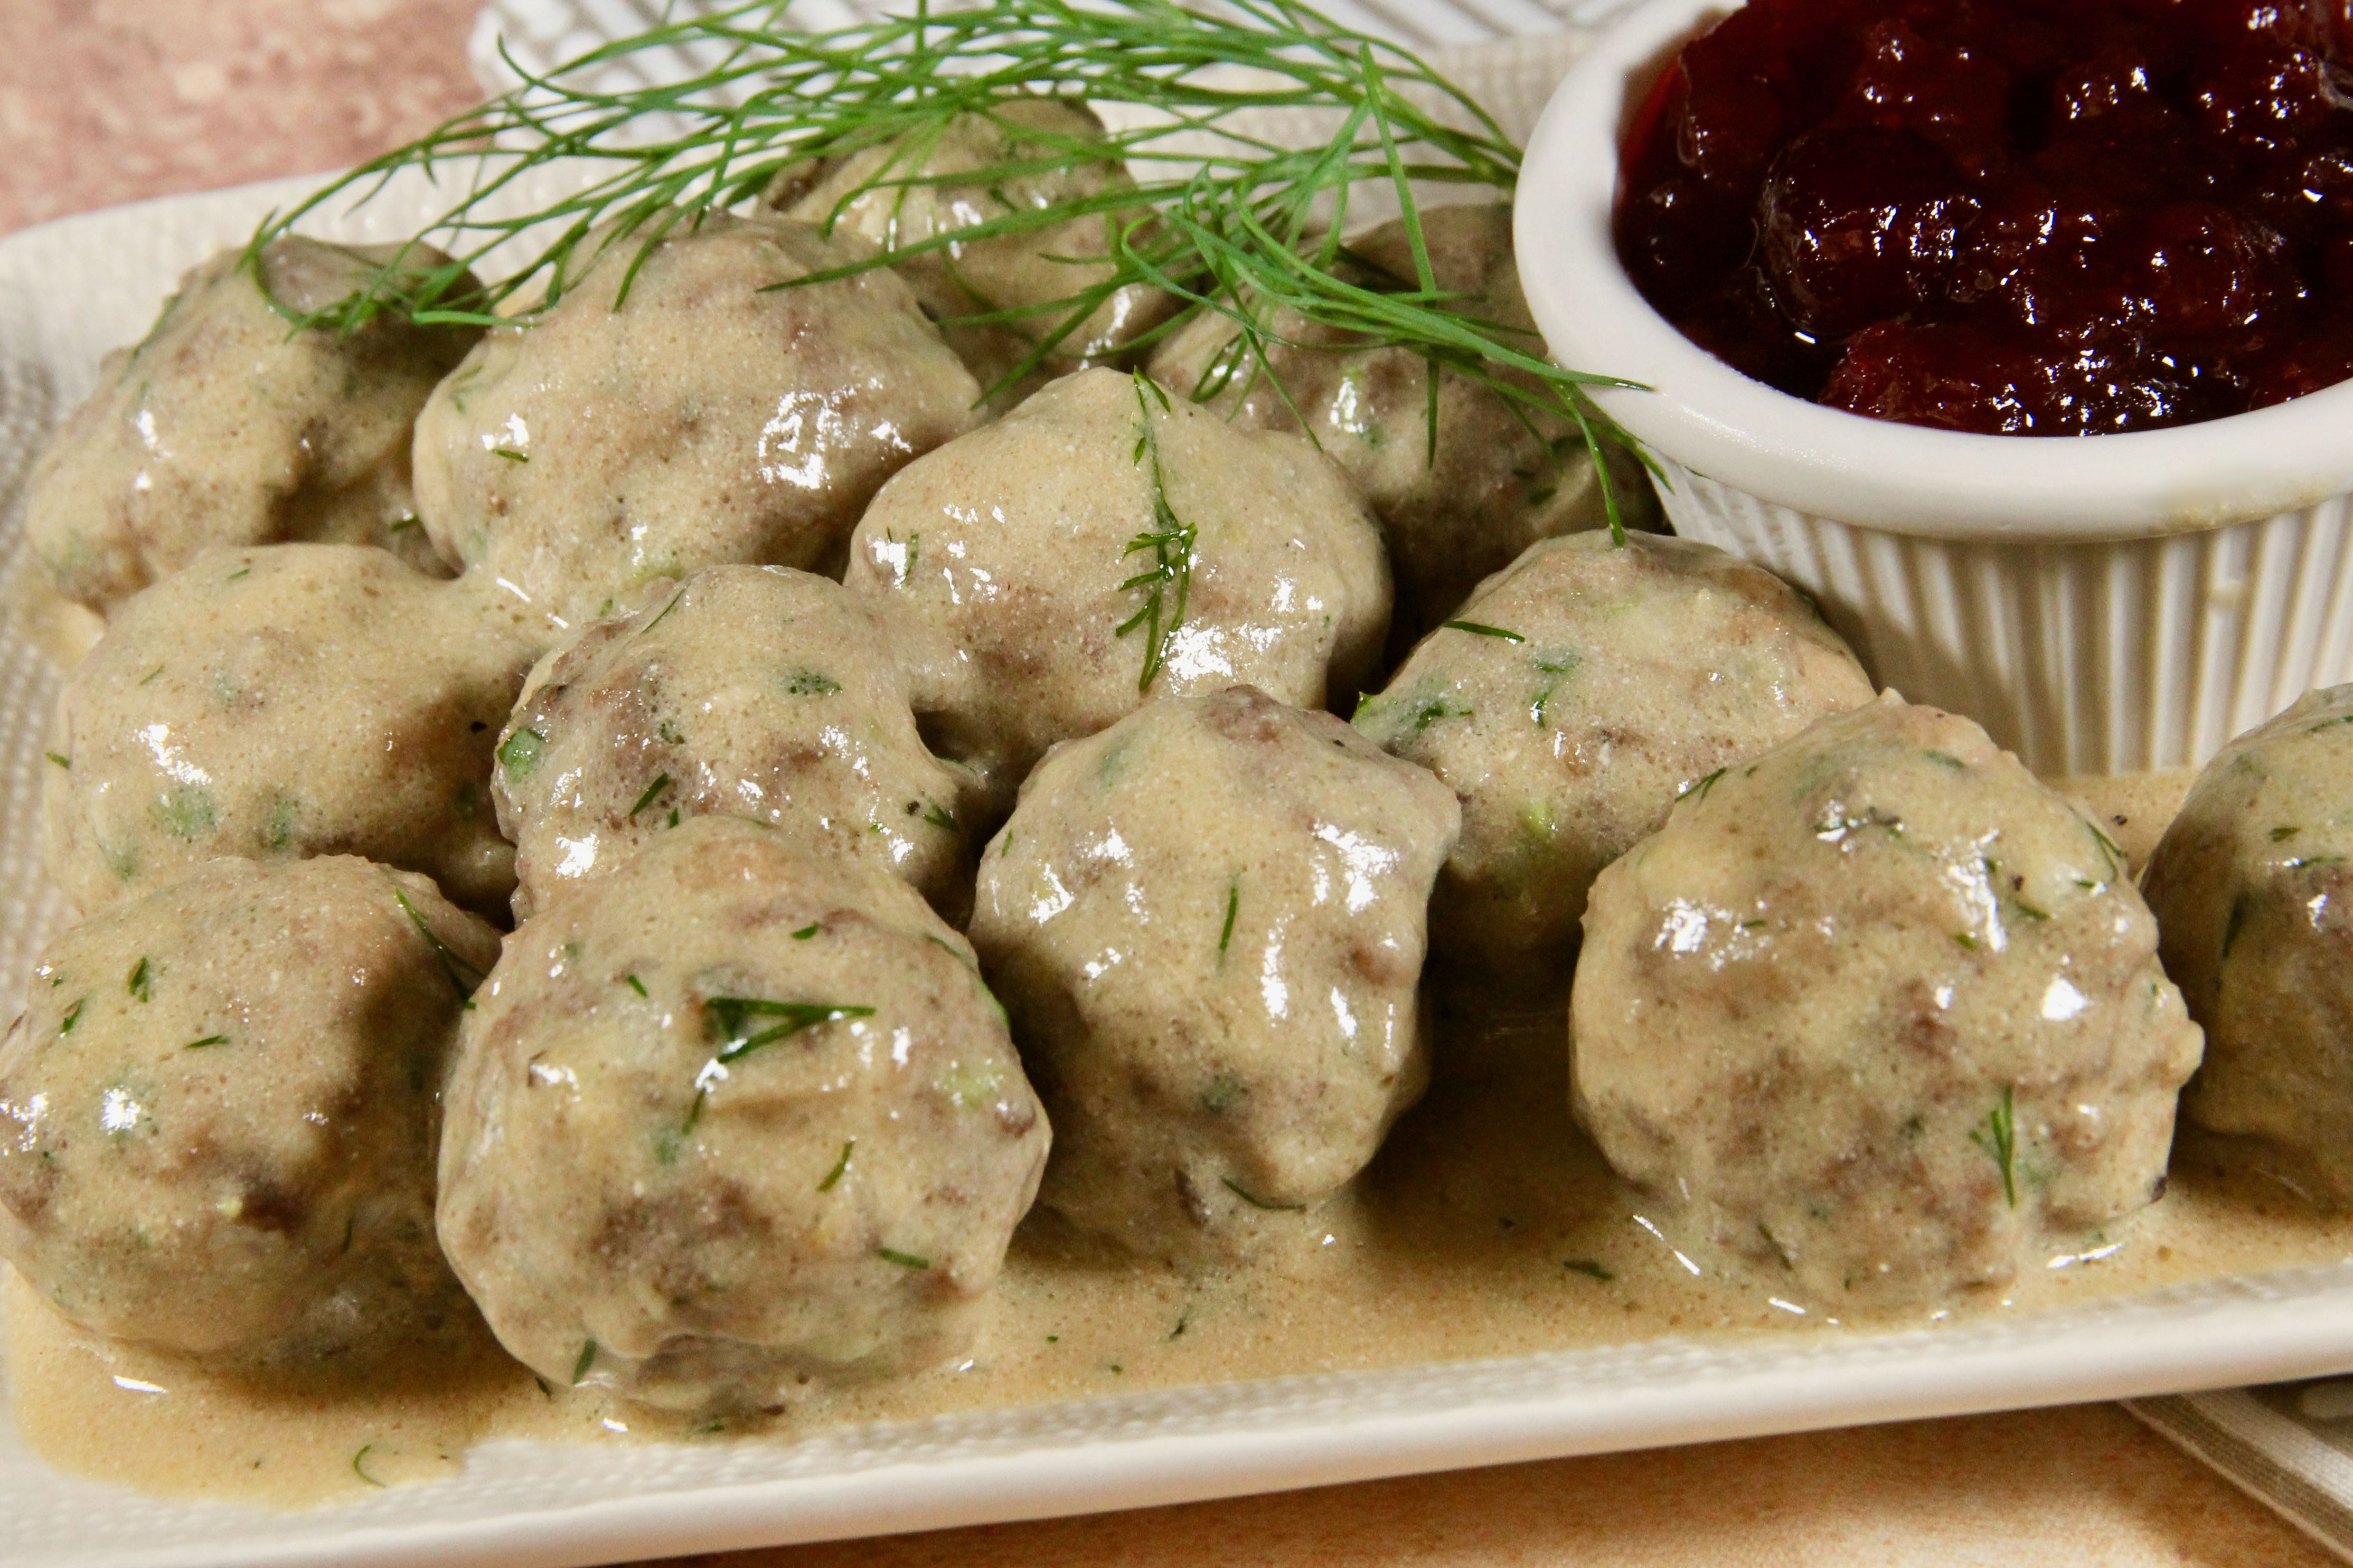 Swedish Meatballs with Creamy Dill Sauce